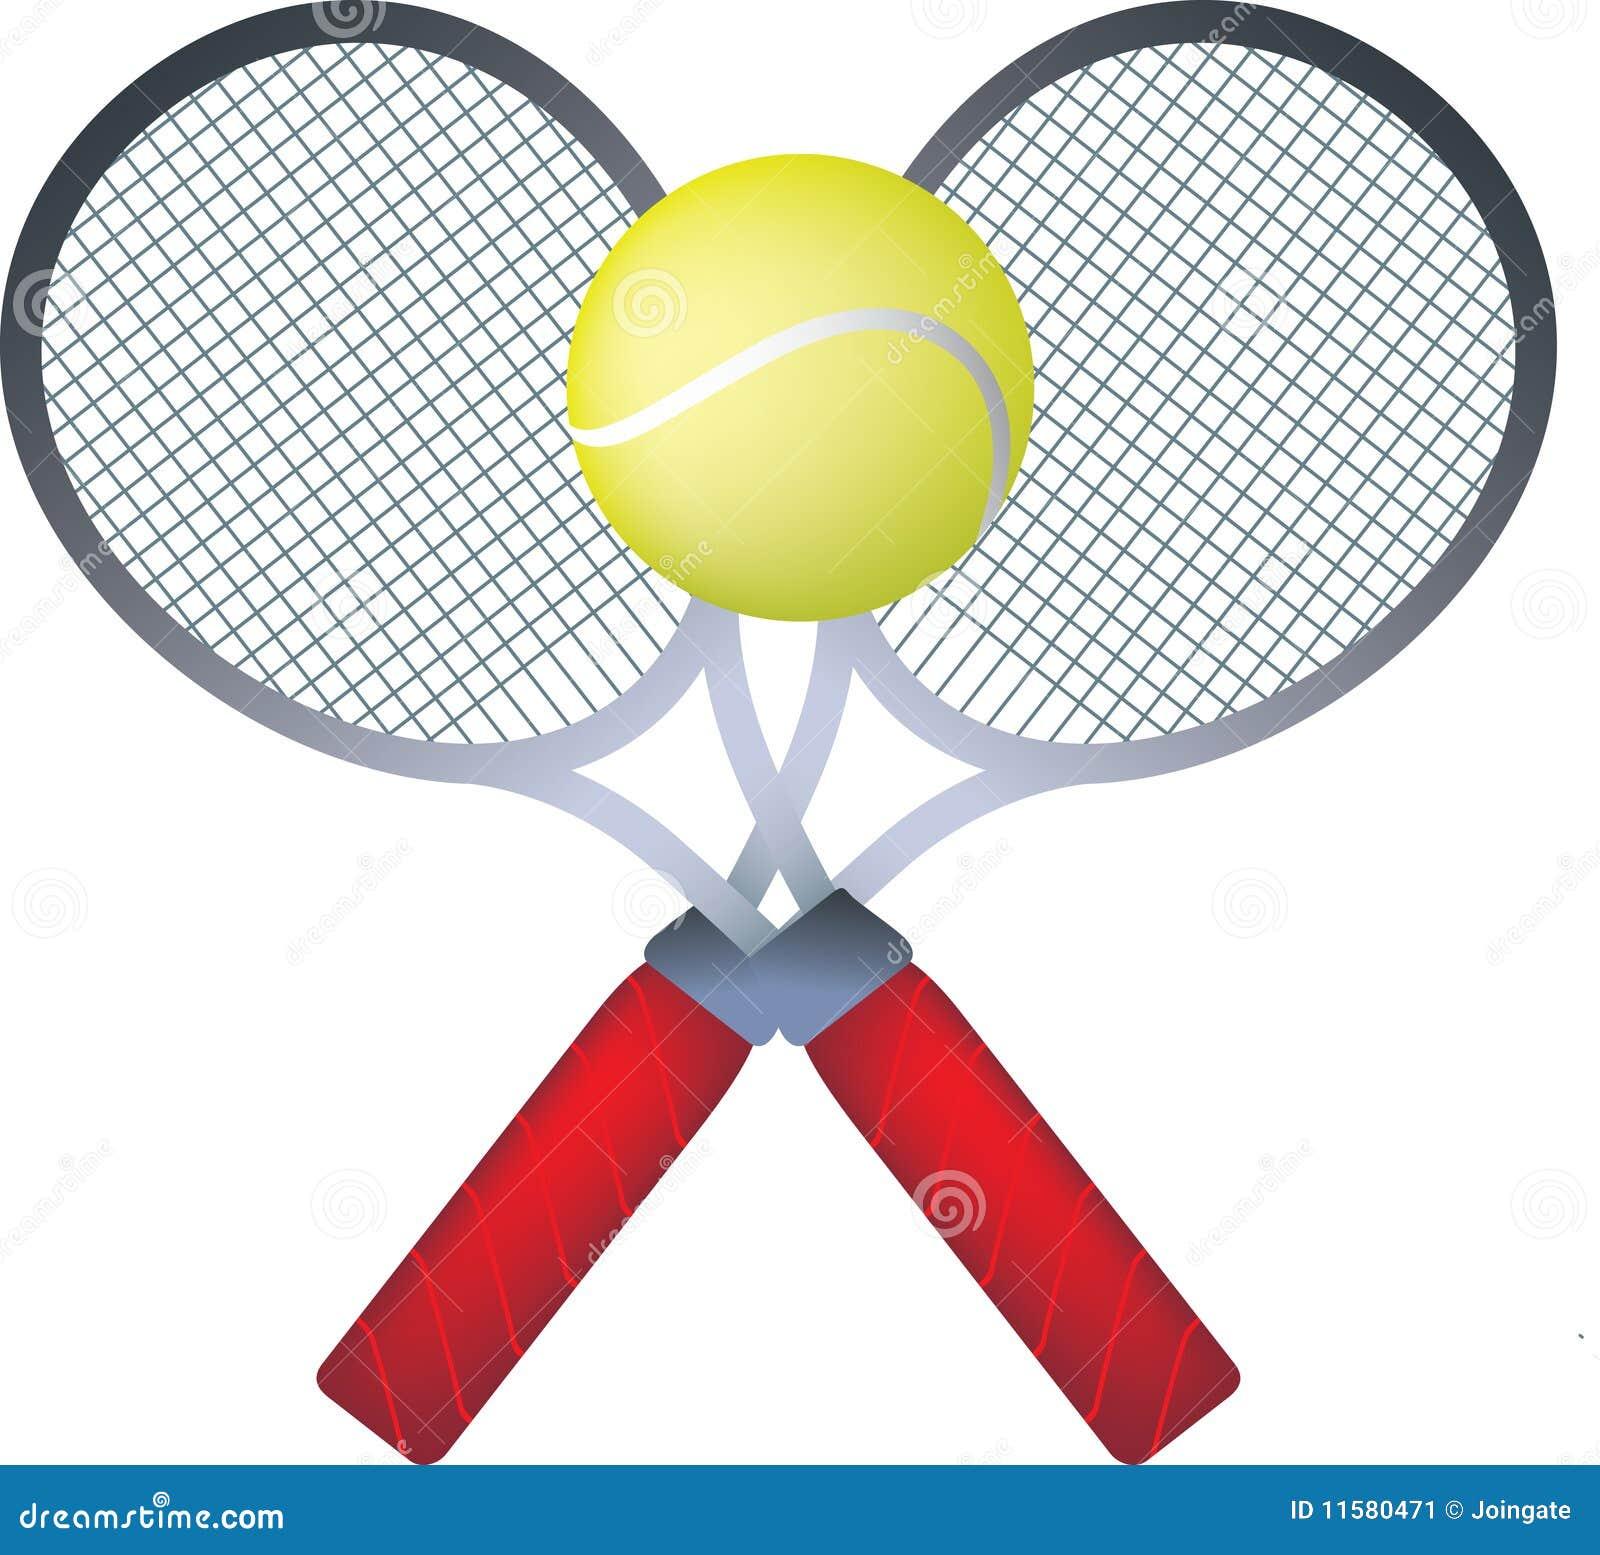 Tennis Rackets Stock Image - Image: 11580471